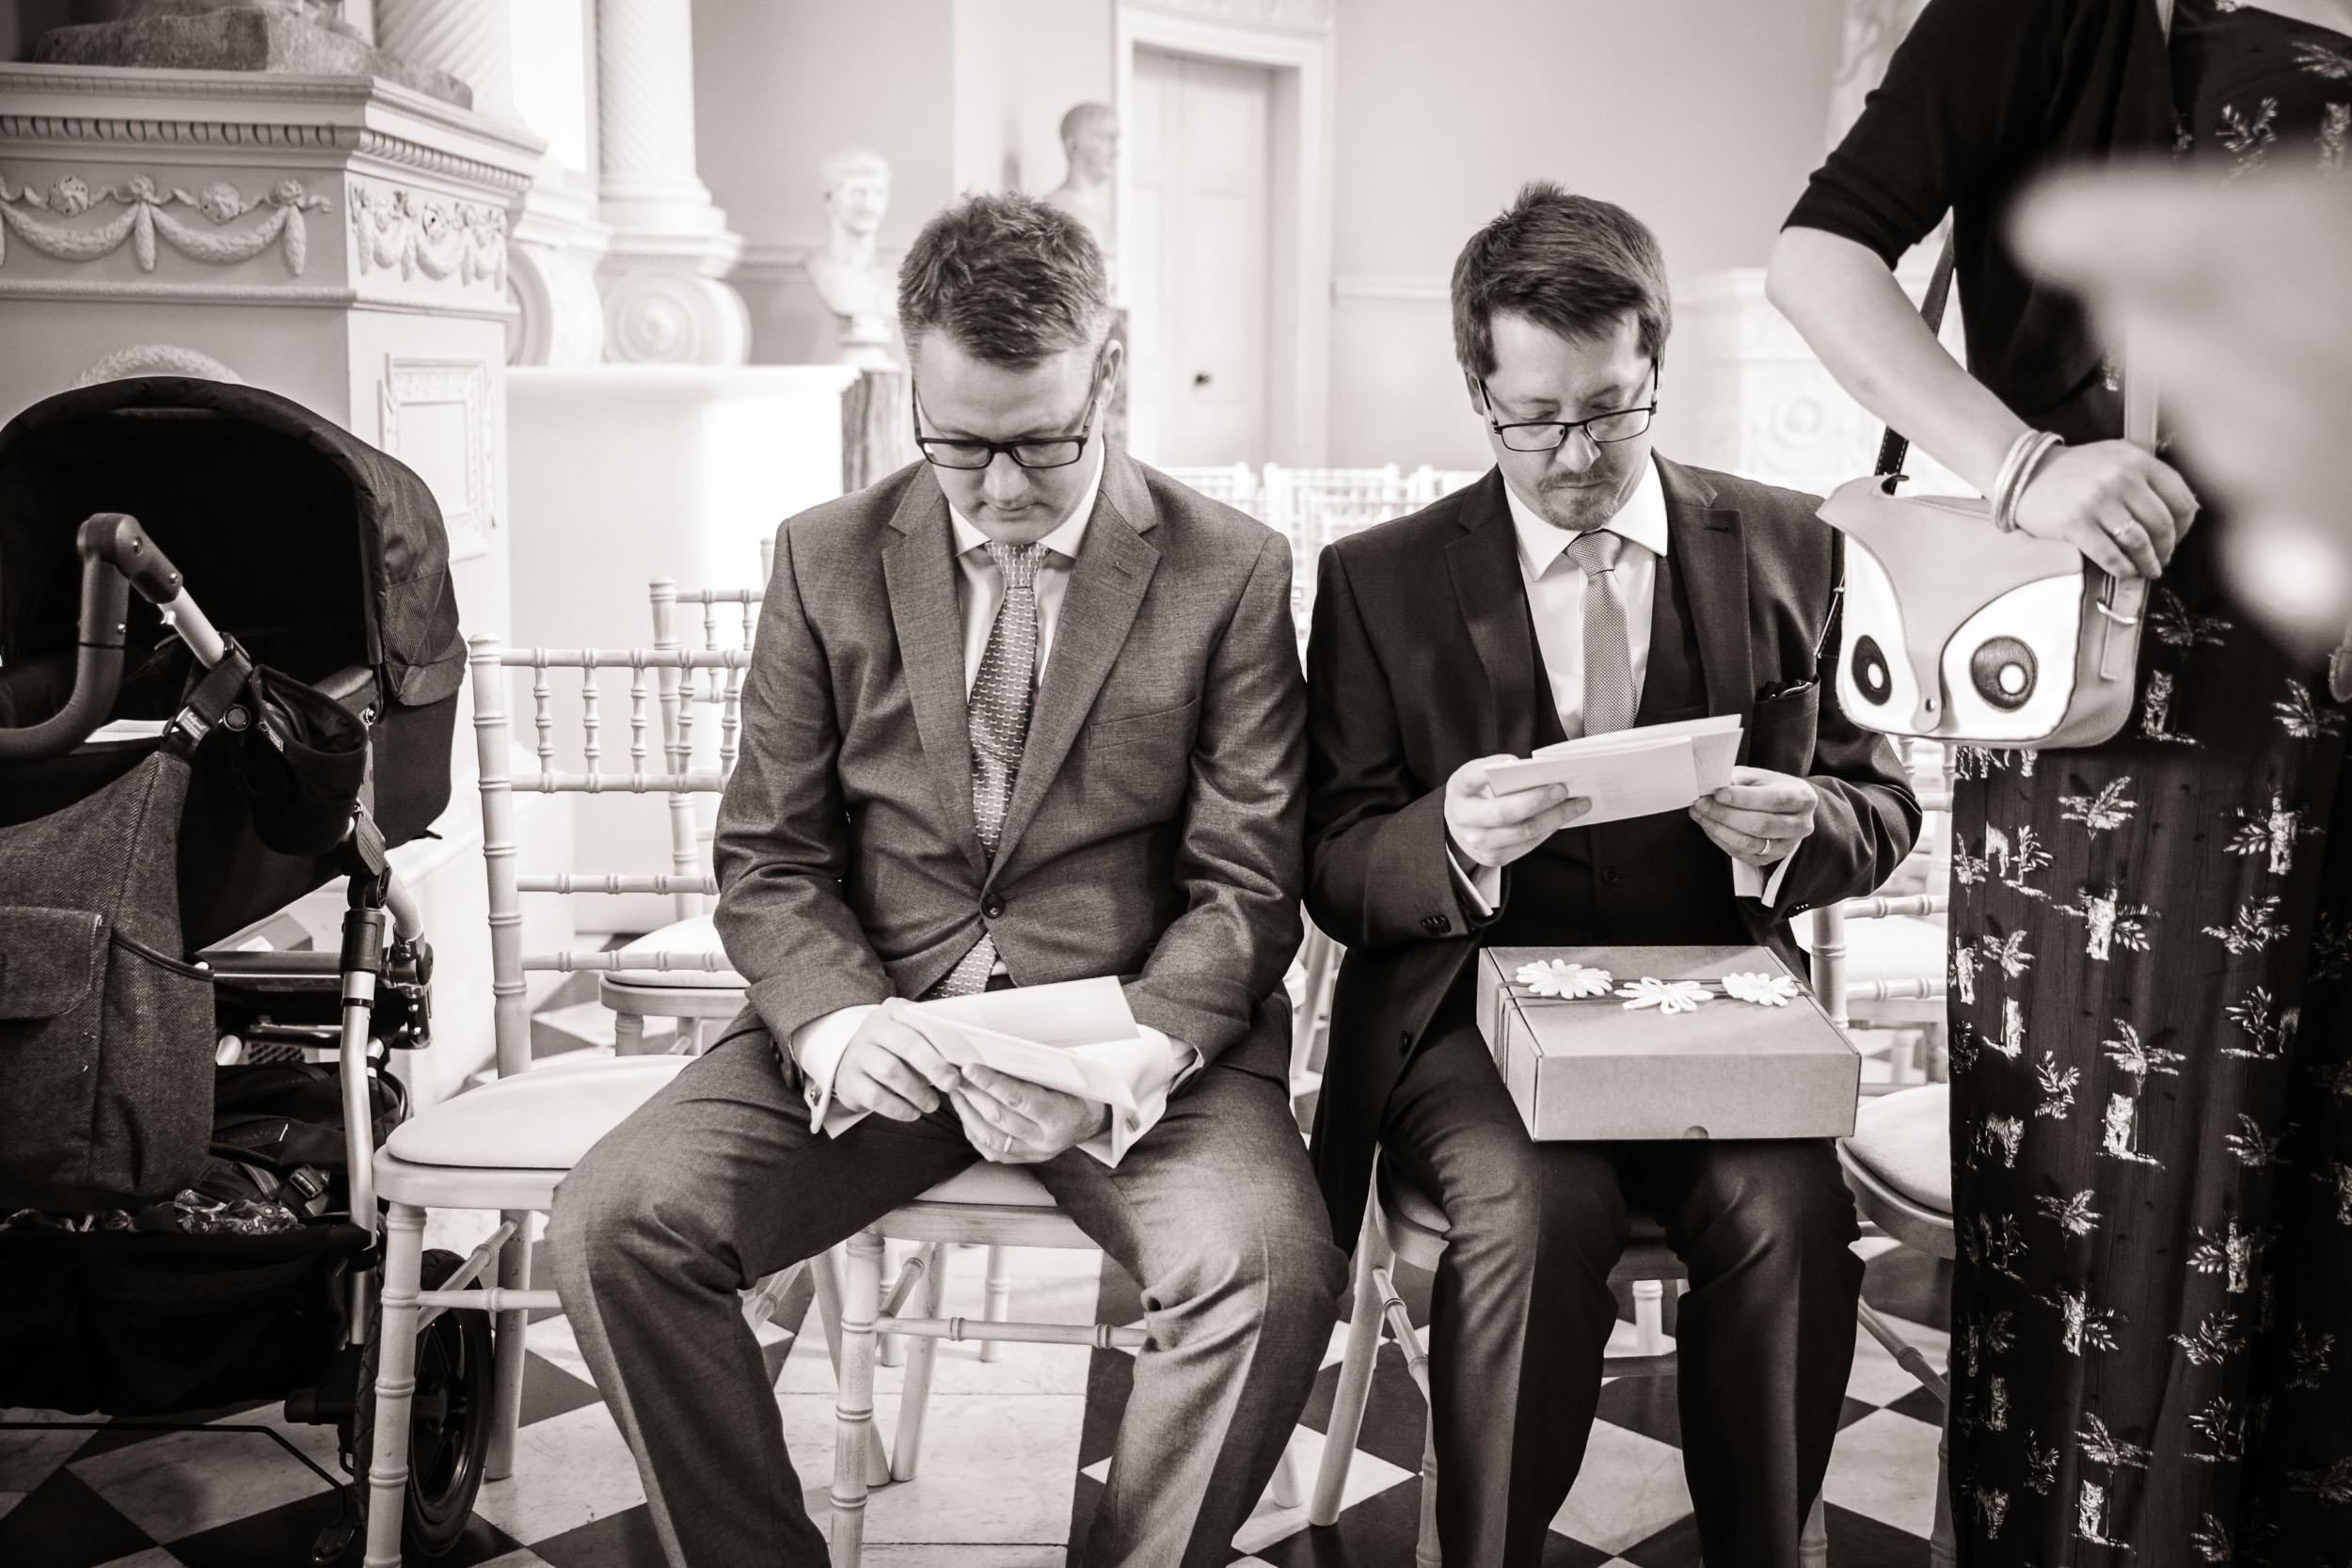 syon-house-wedding-photographer-london 033.jpg